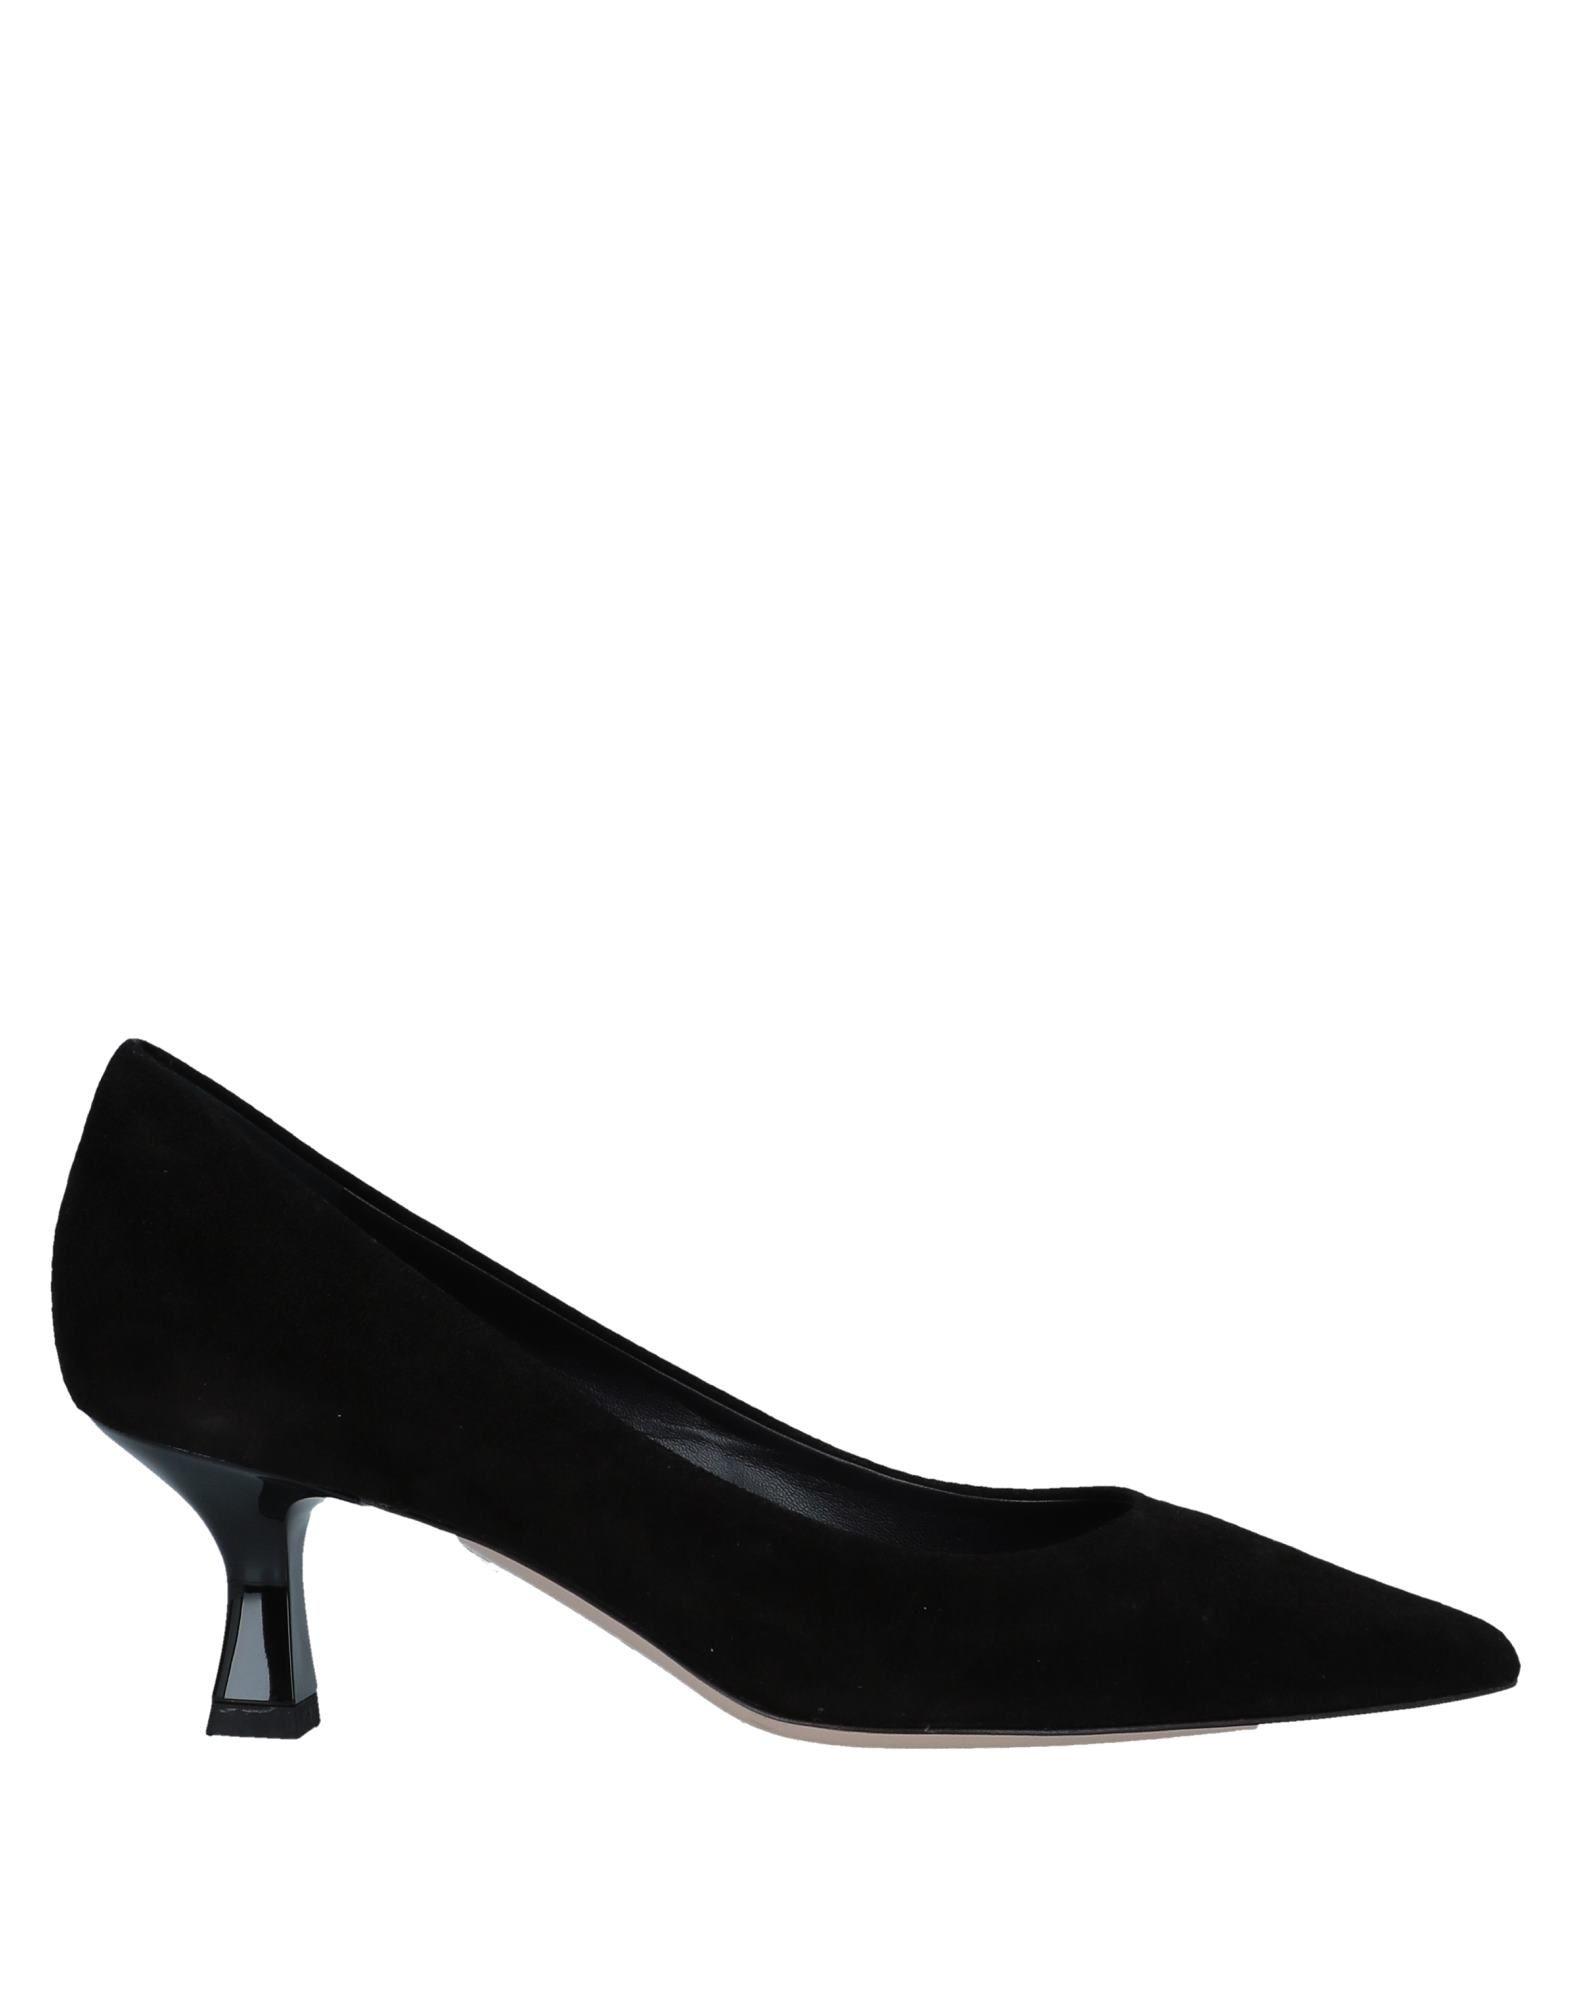 Stilvolle billige Pumps Schuhe Deimille Pumps billige Damen  11556110QG de9577